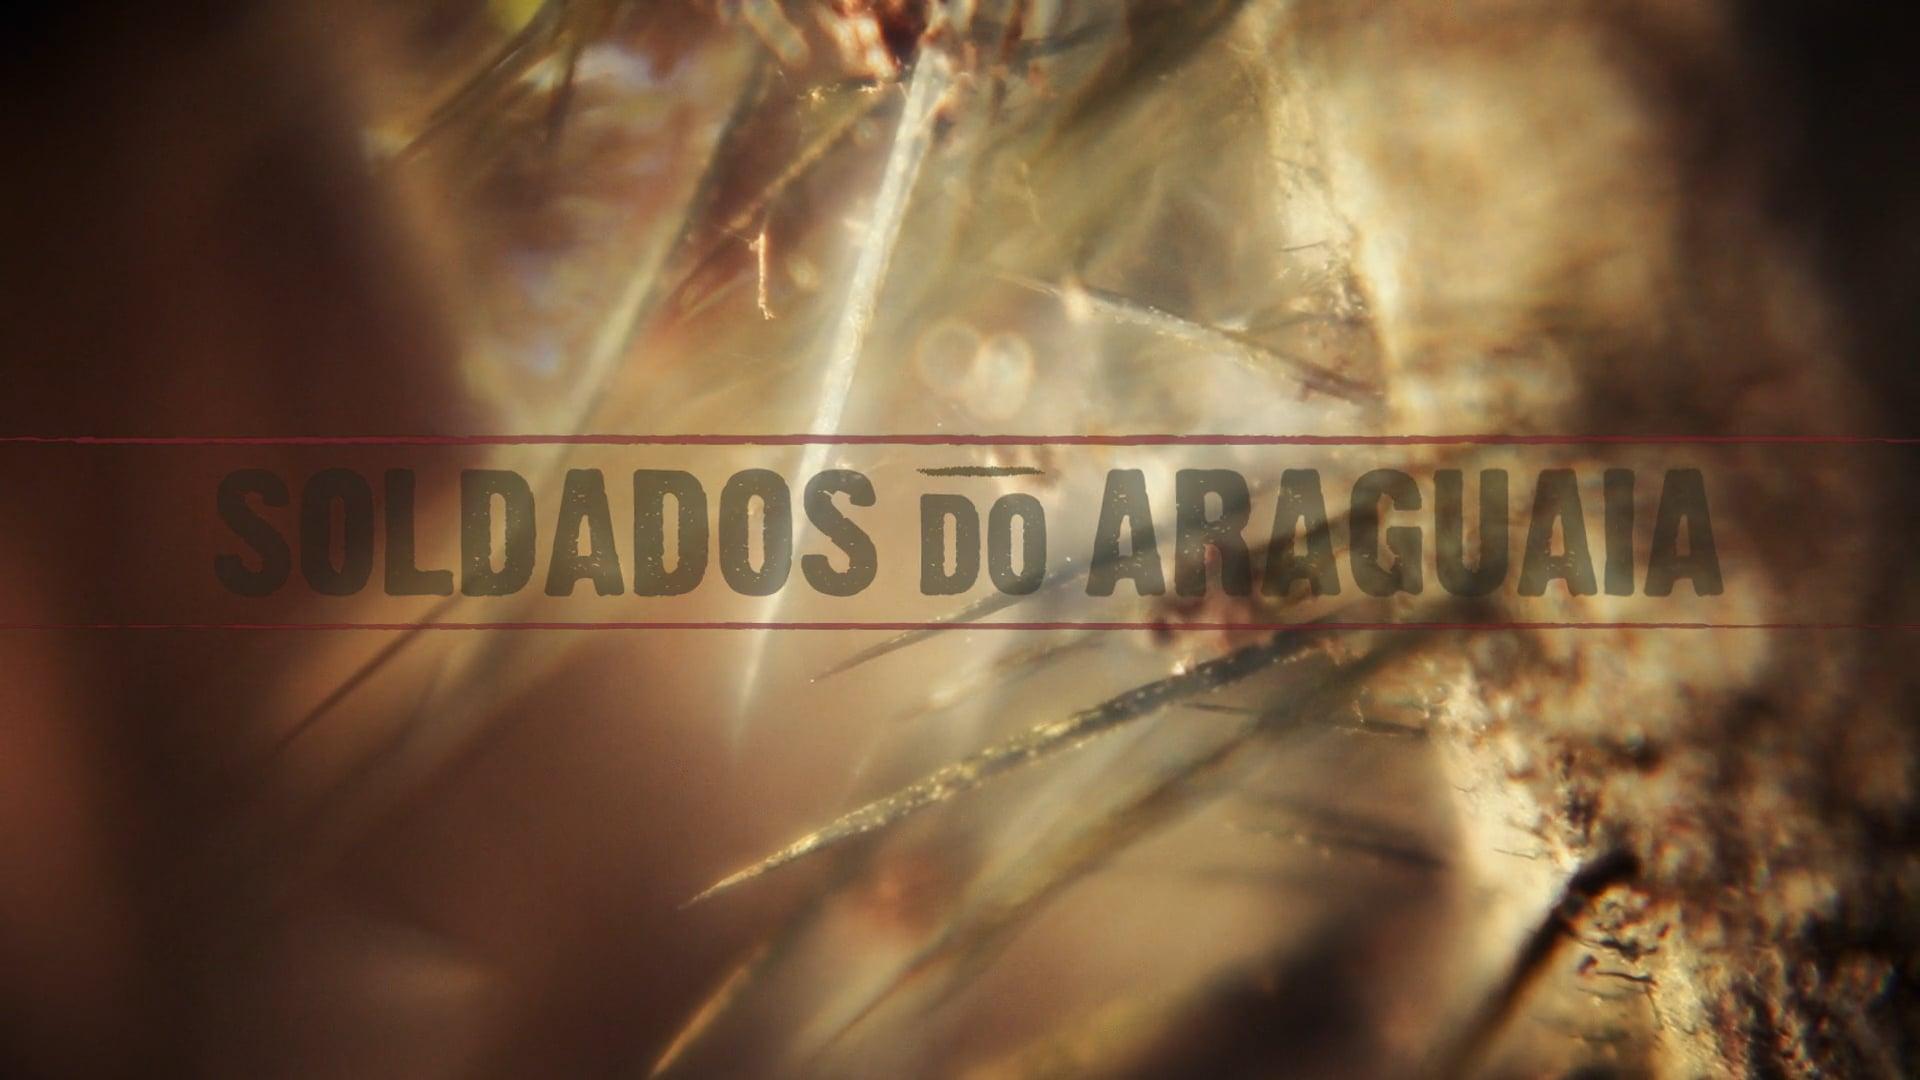 TRAILER - Soldados do Araguaia